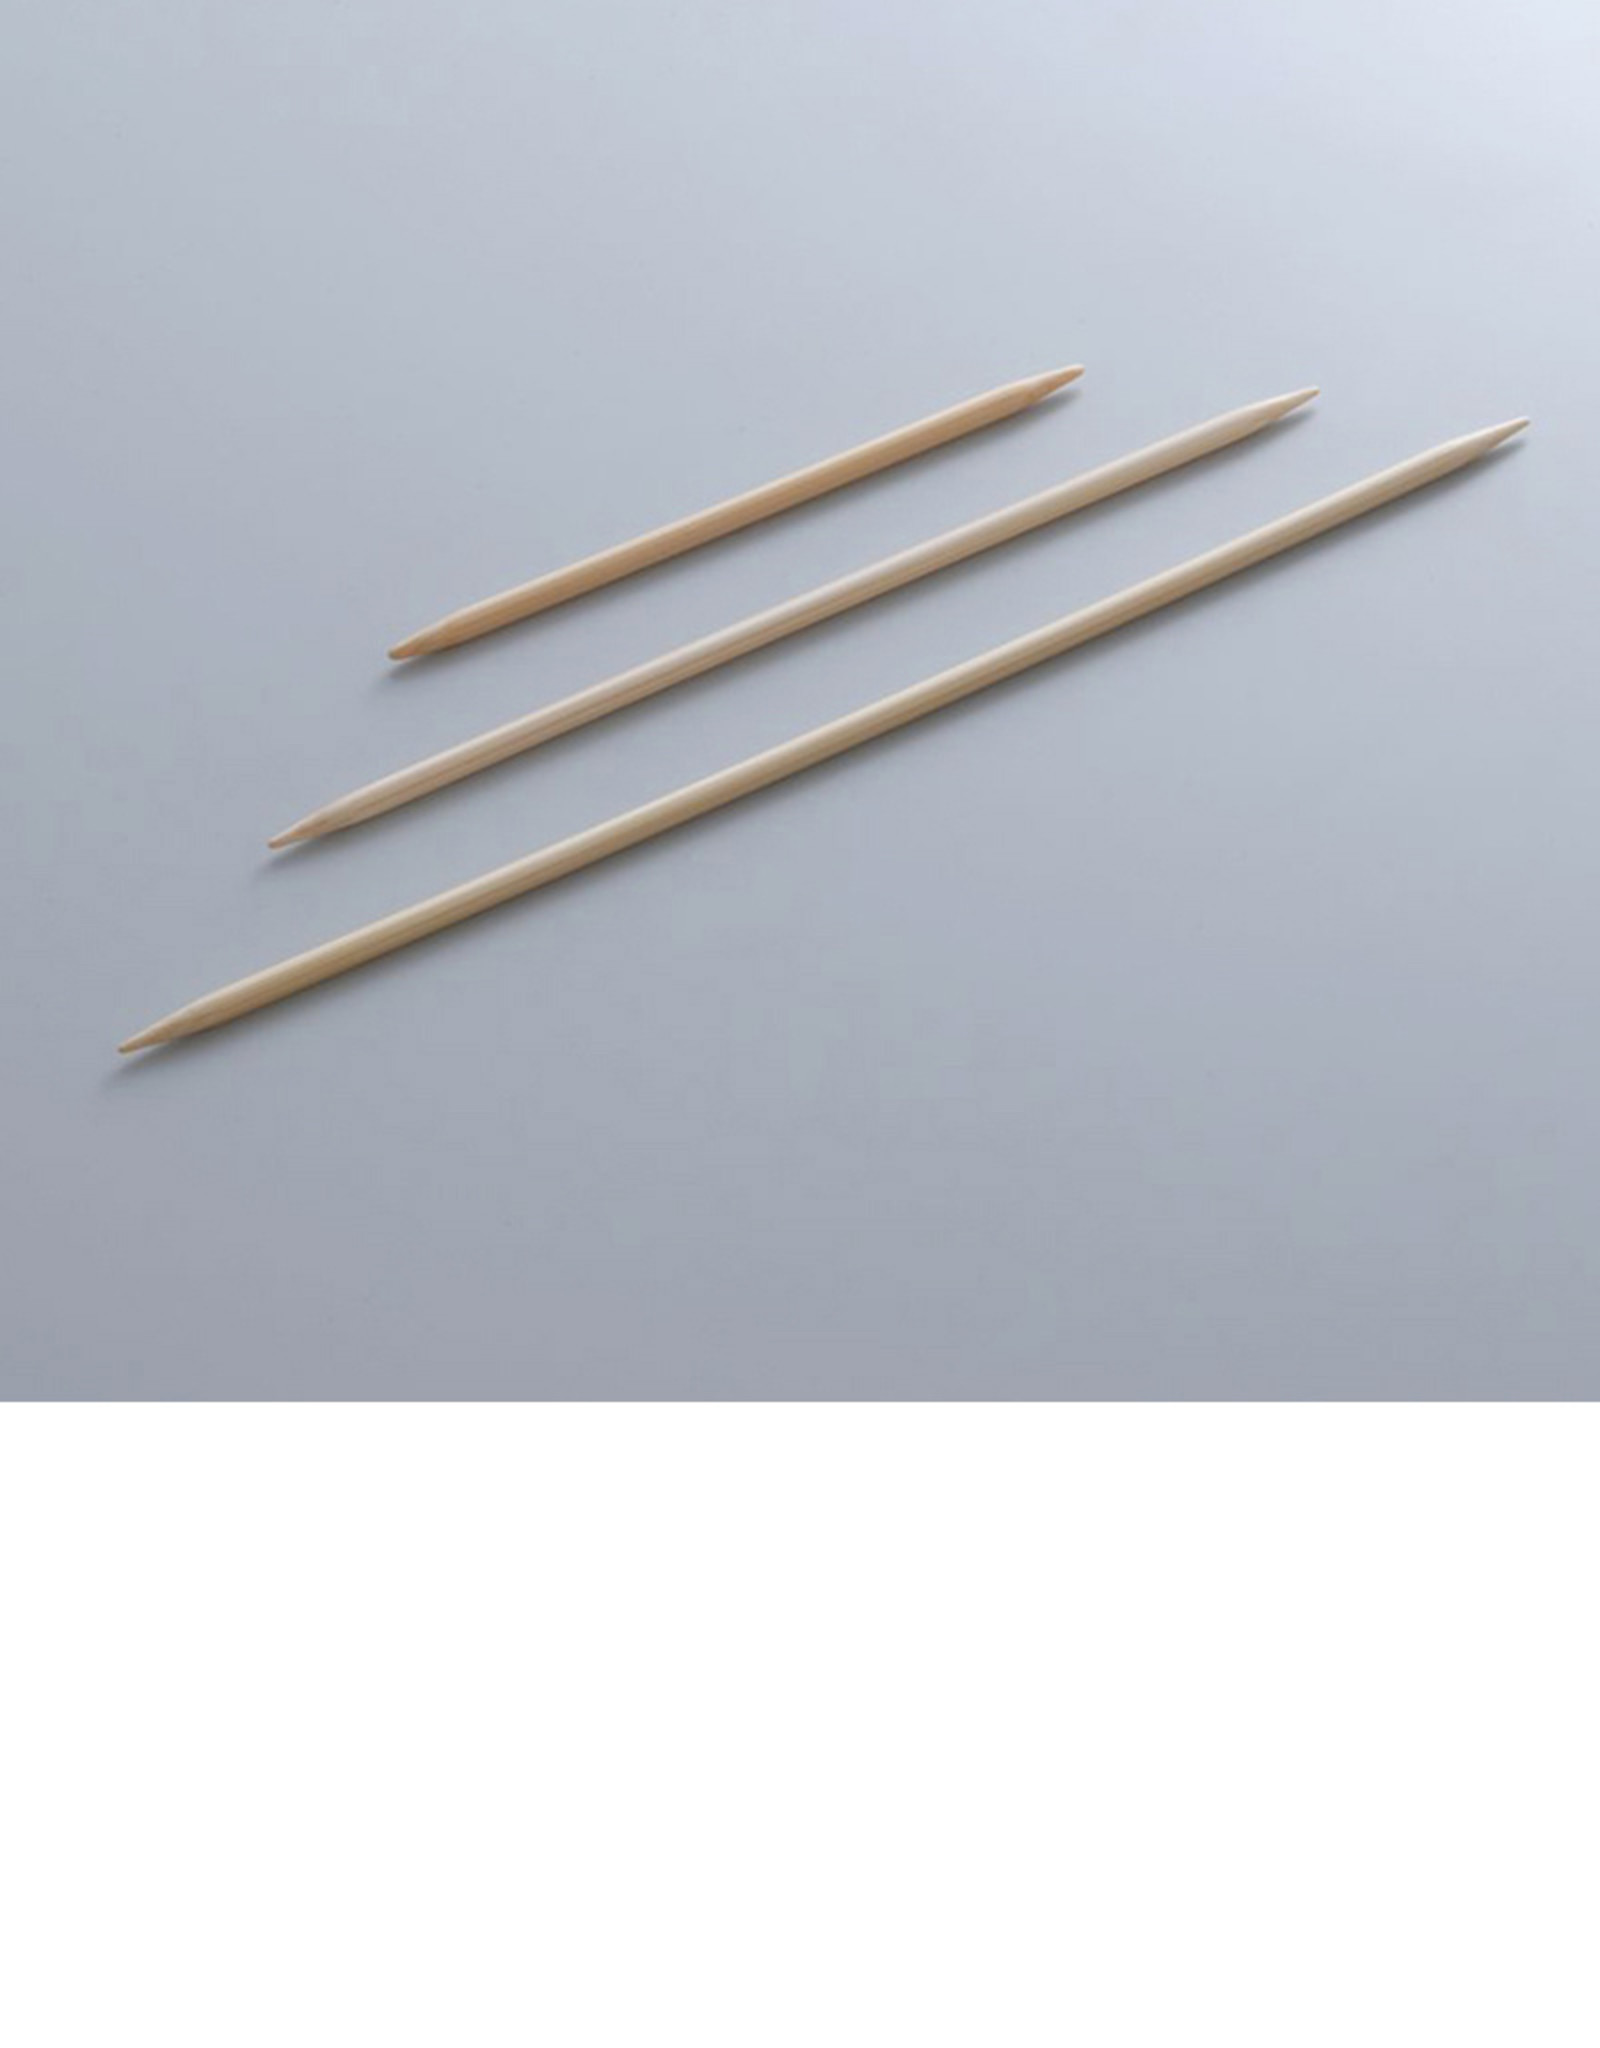 Kinki Amibari KA Double Point Needles US 7